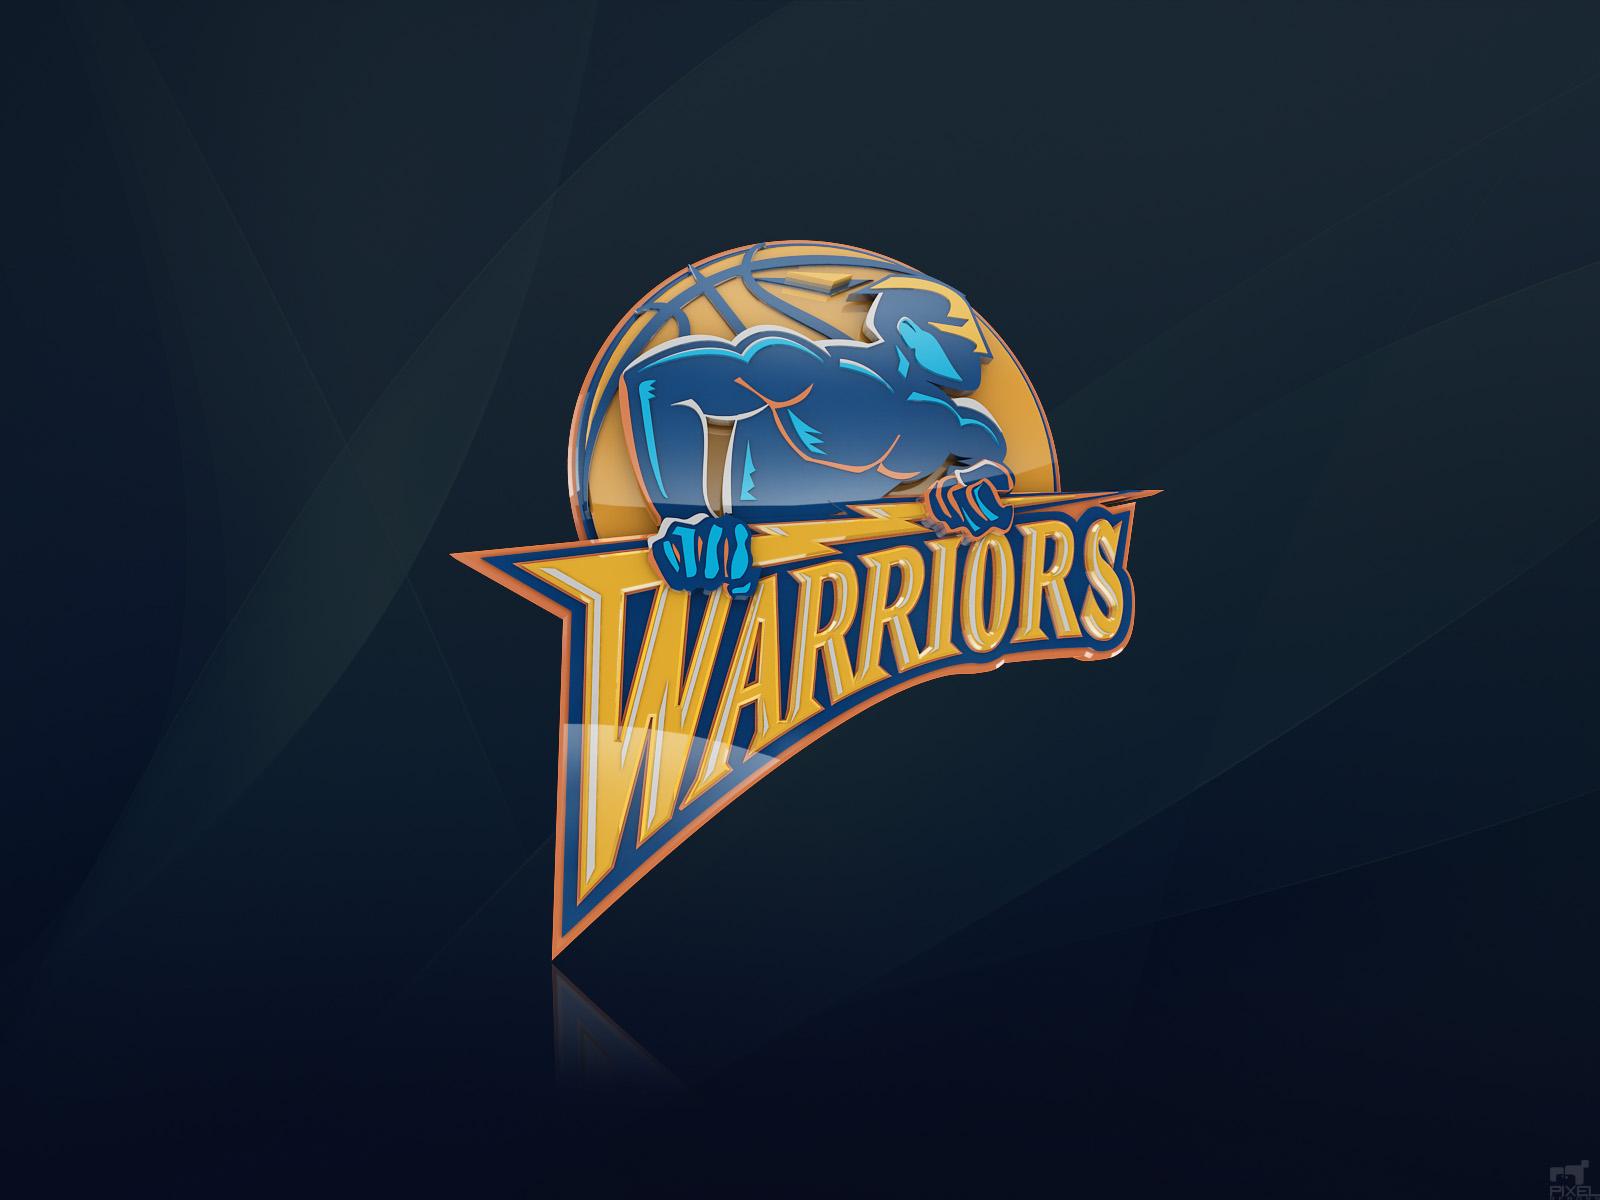 I Golden State Warriors pronti a tornare a San Francisco